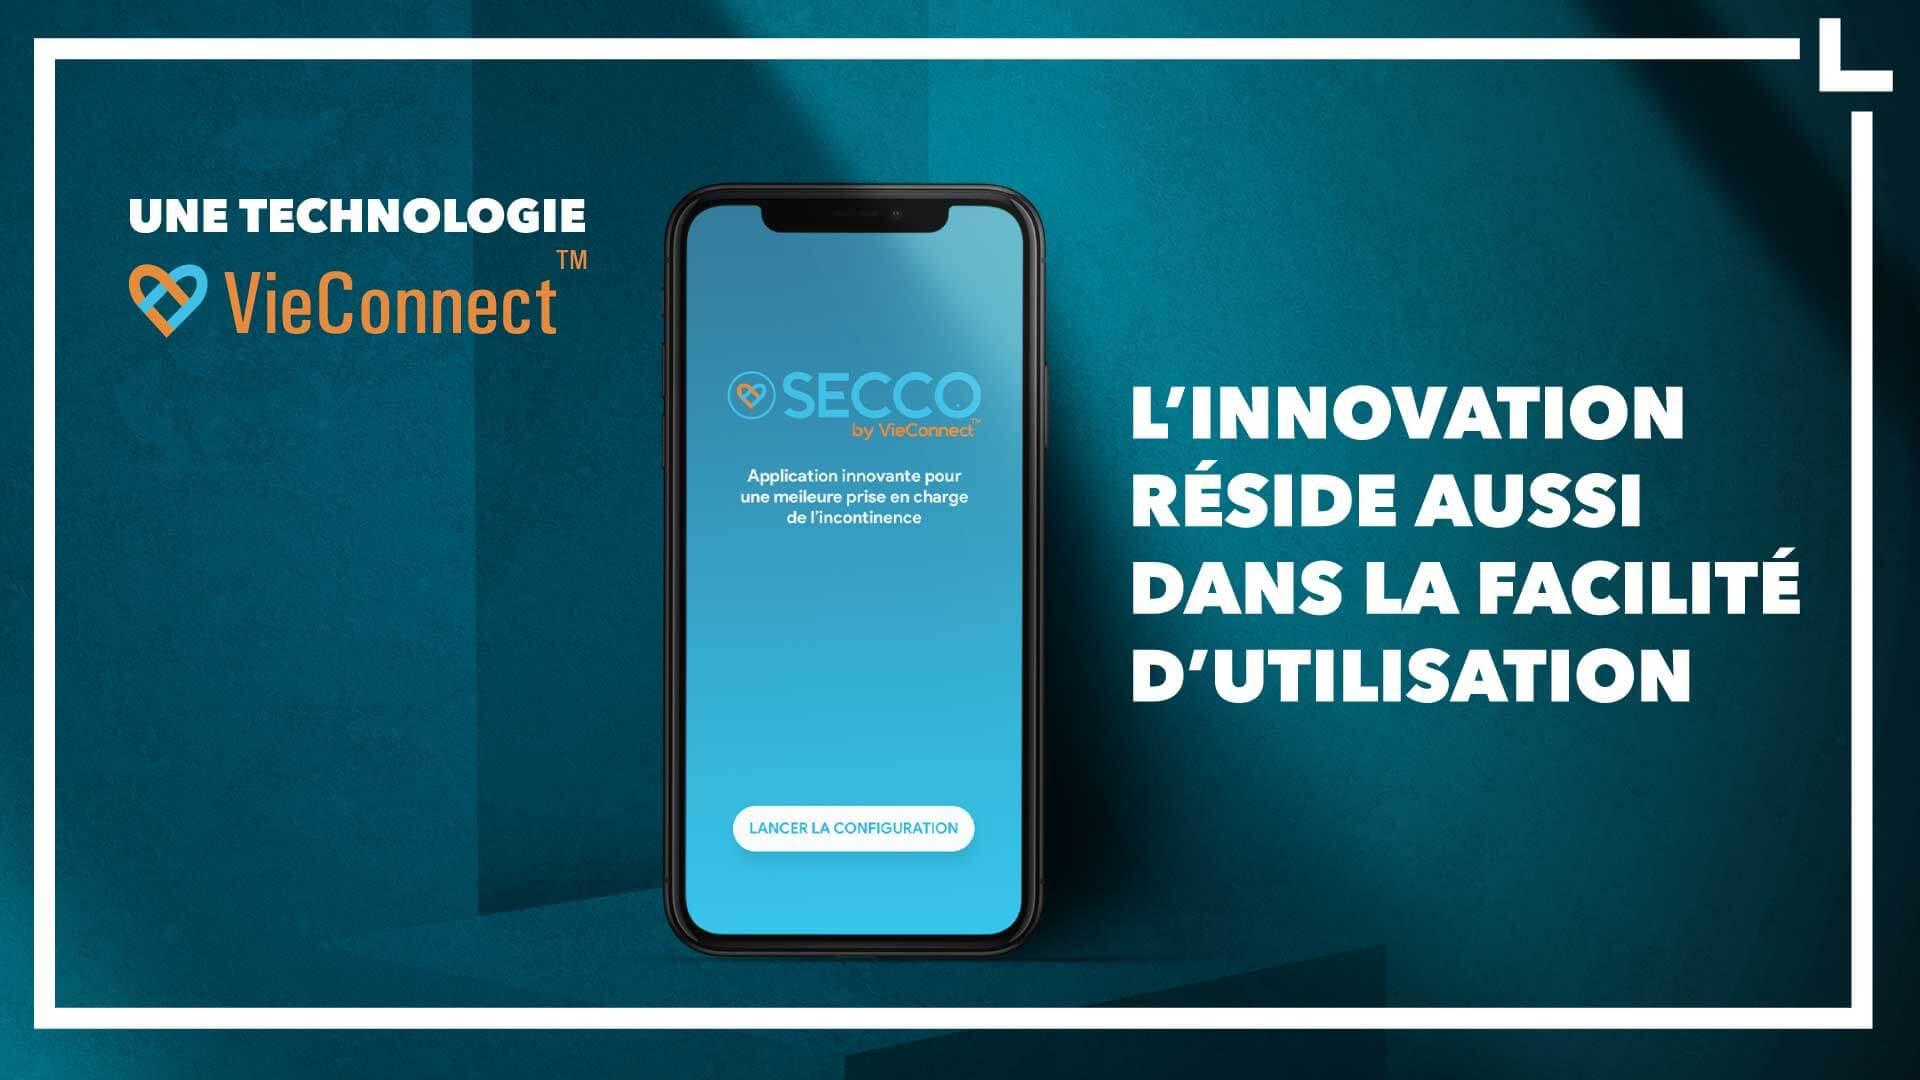 VieConnect-innovation-pour-incontinence-en-ehpad-facile-a-utiliser